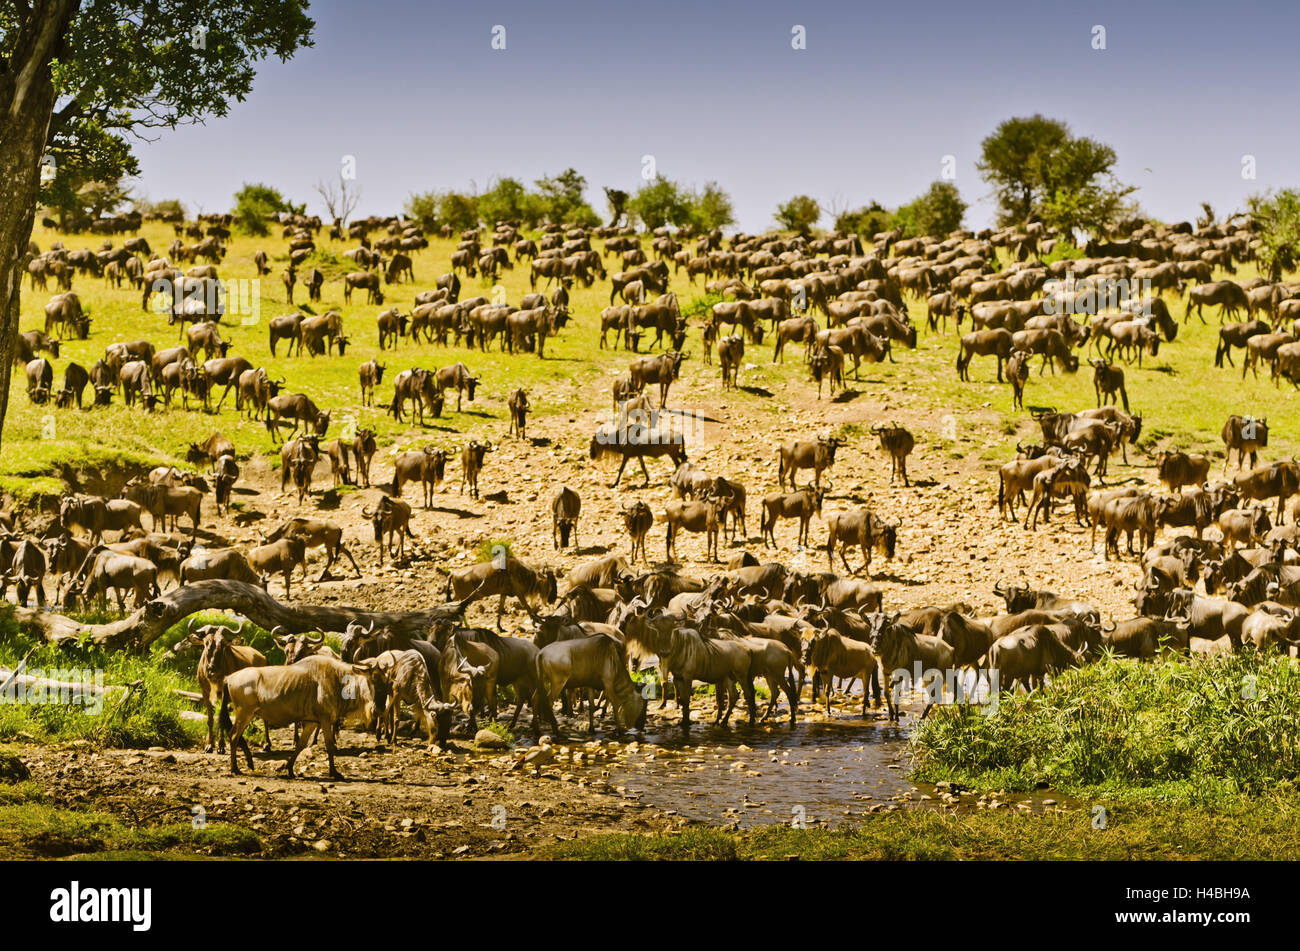 Africa, East Africa, Tanzania, Serengeti, wildlife, gnus, - Stock Image